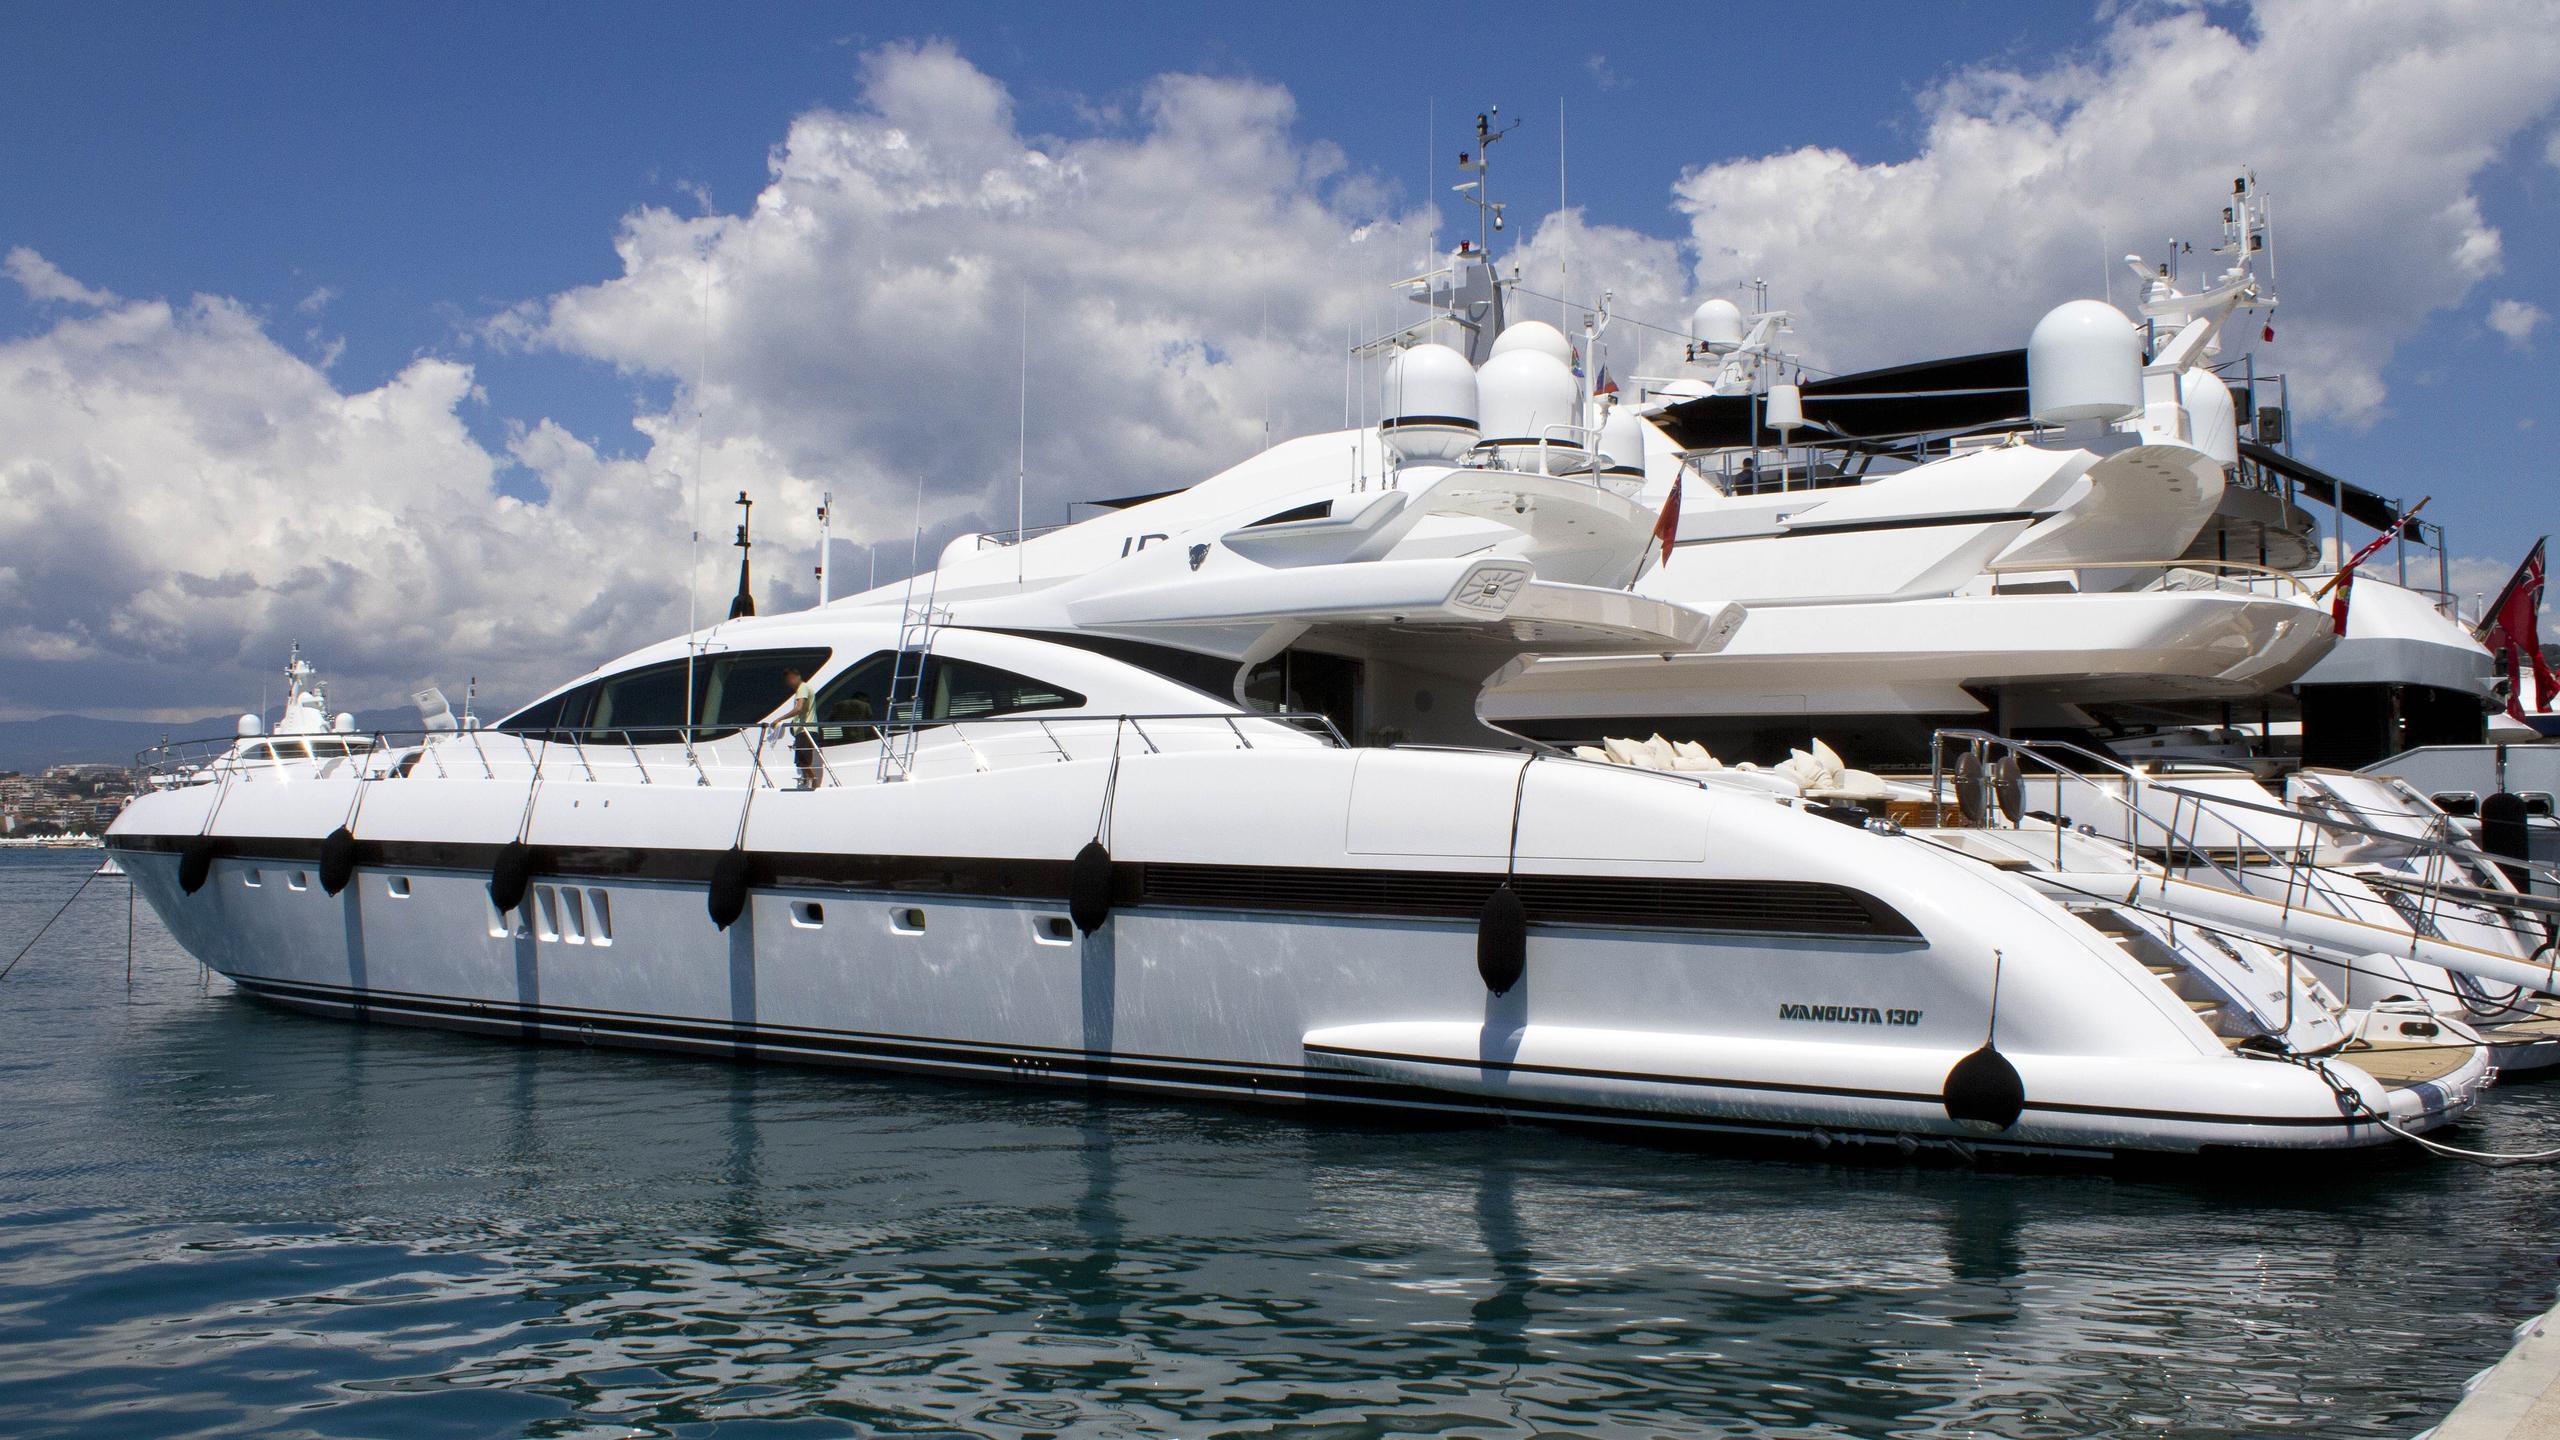 african-cat-motor-yacht-overmarine-mangusta-130s-sport-2007-40m-bow